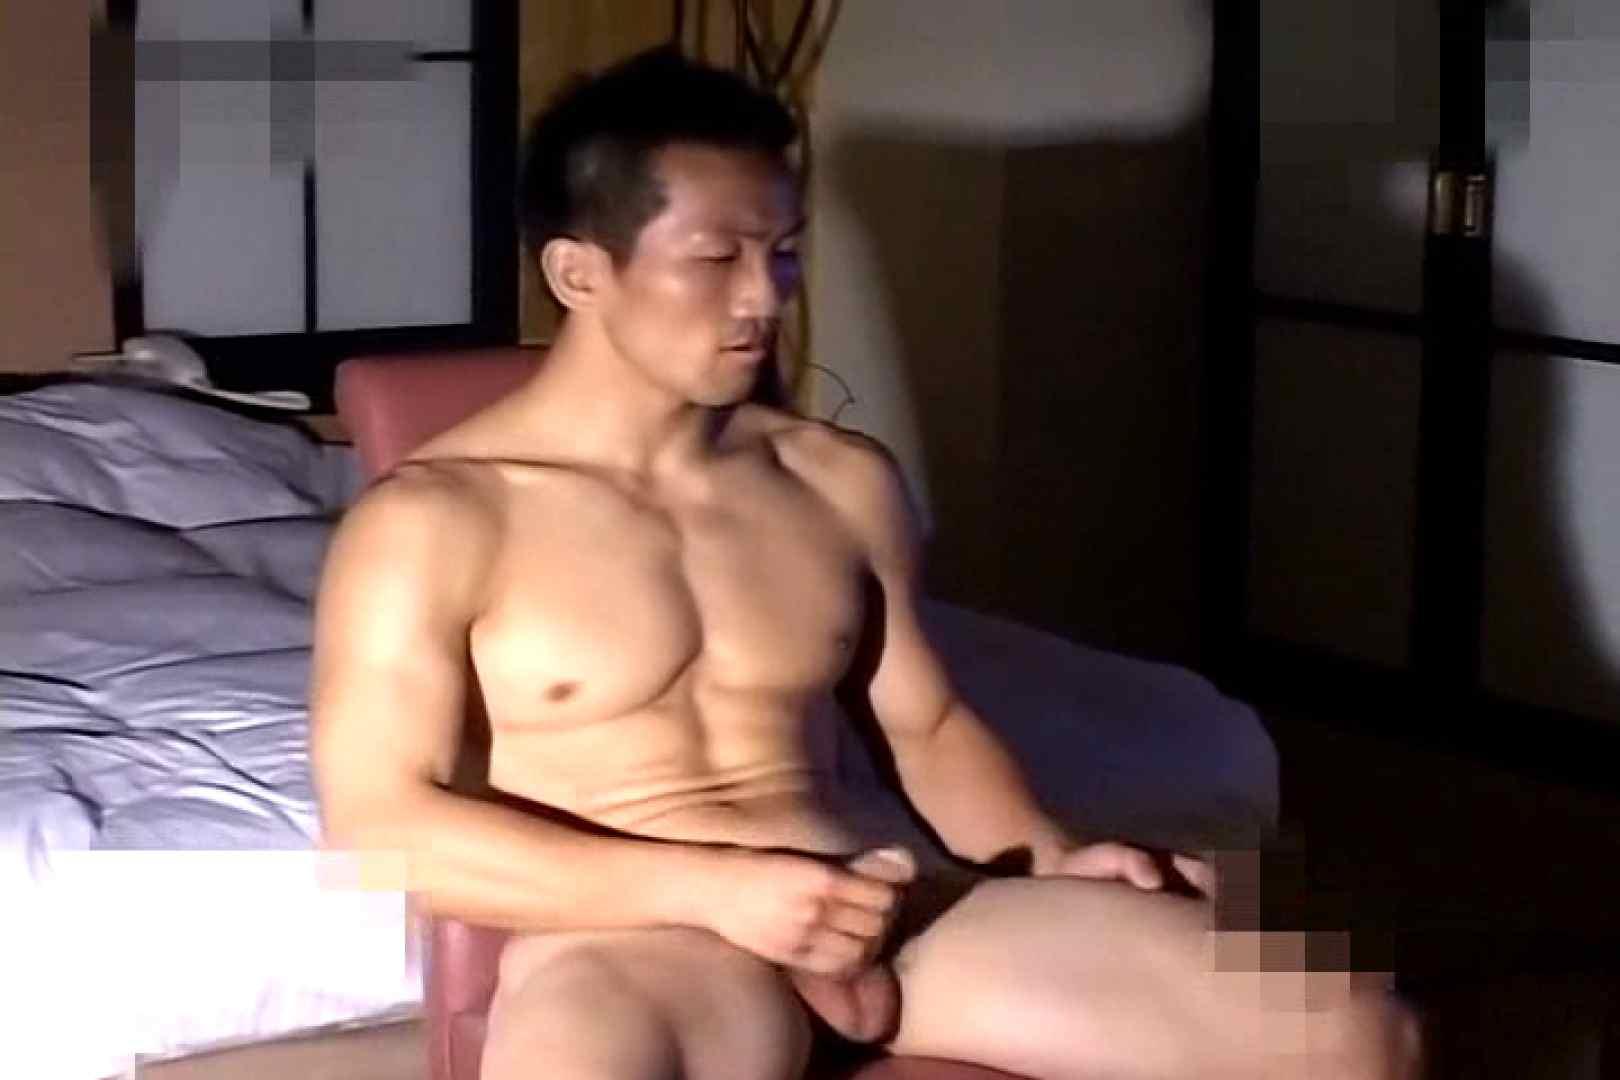 Beautiful muscle モッコリ野郎達!Vol.06 手コキ 男同士動画 16連発 5